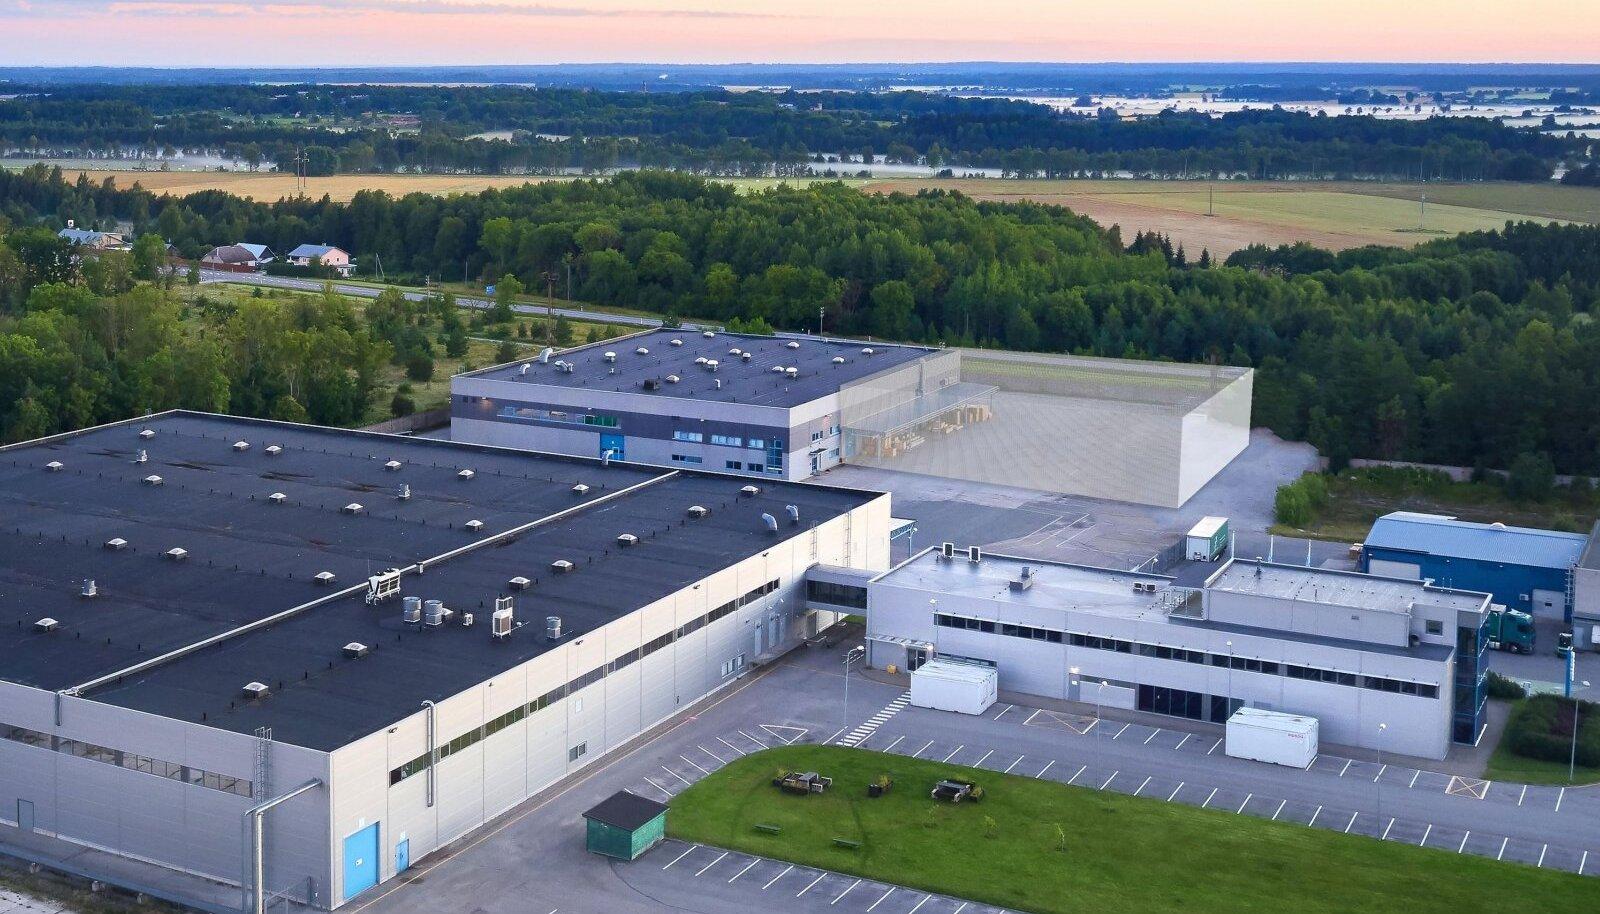 Ensto planeeritav uus tehas